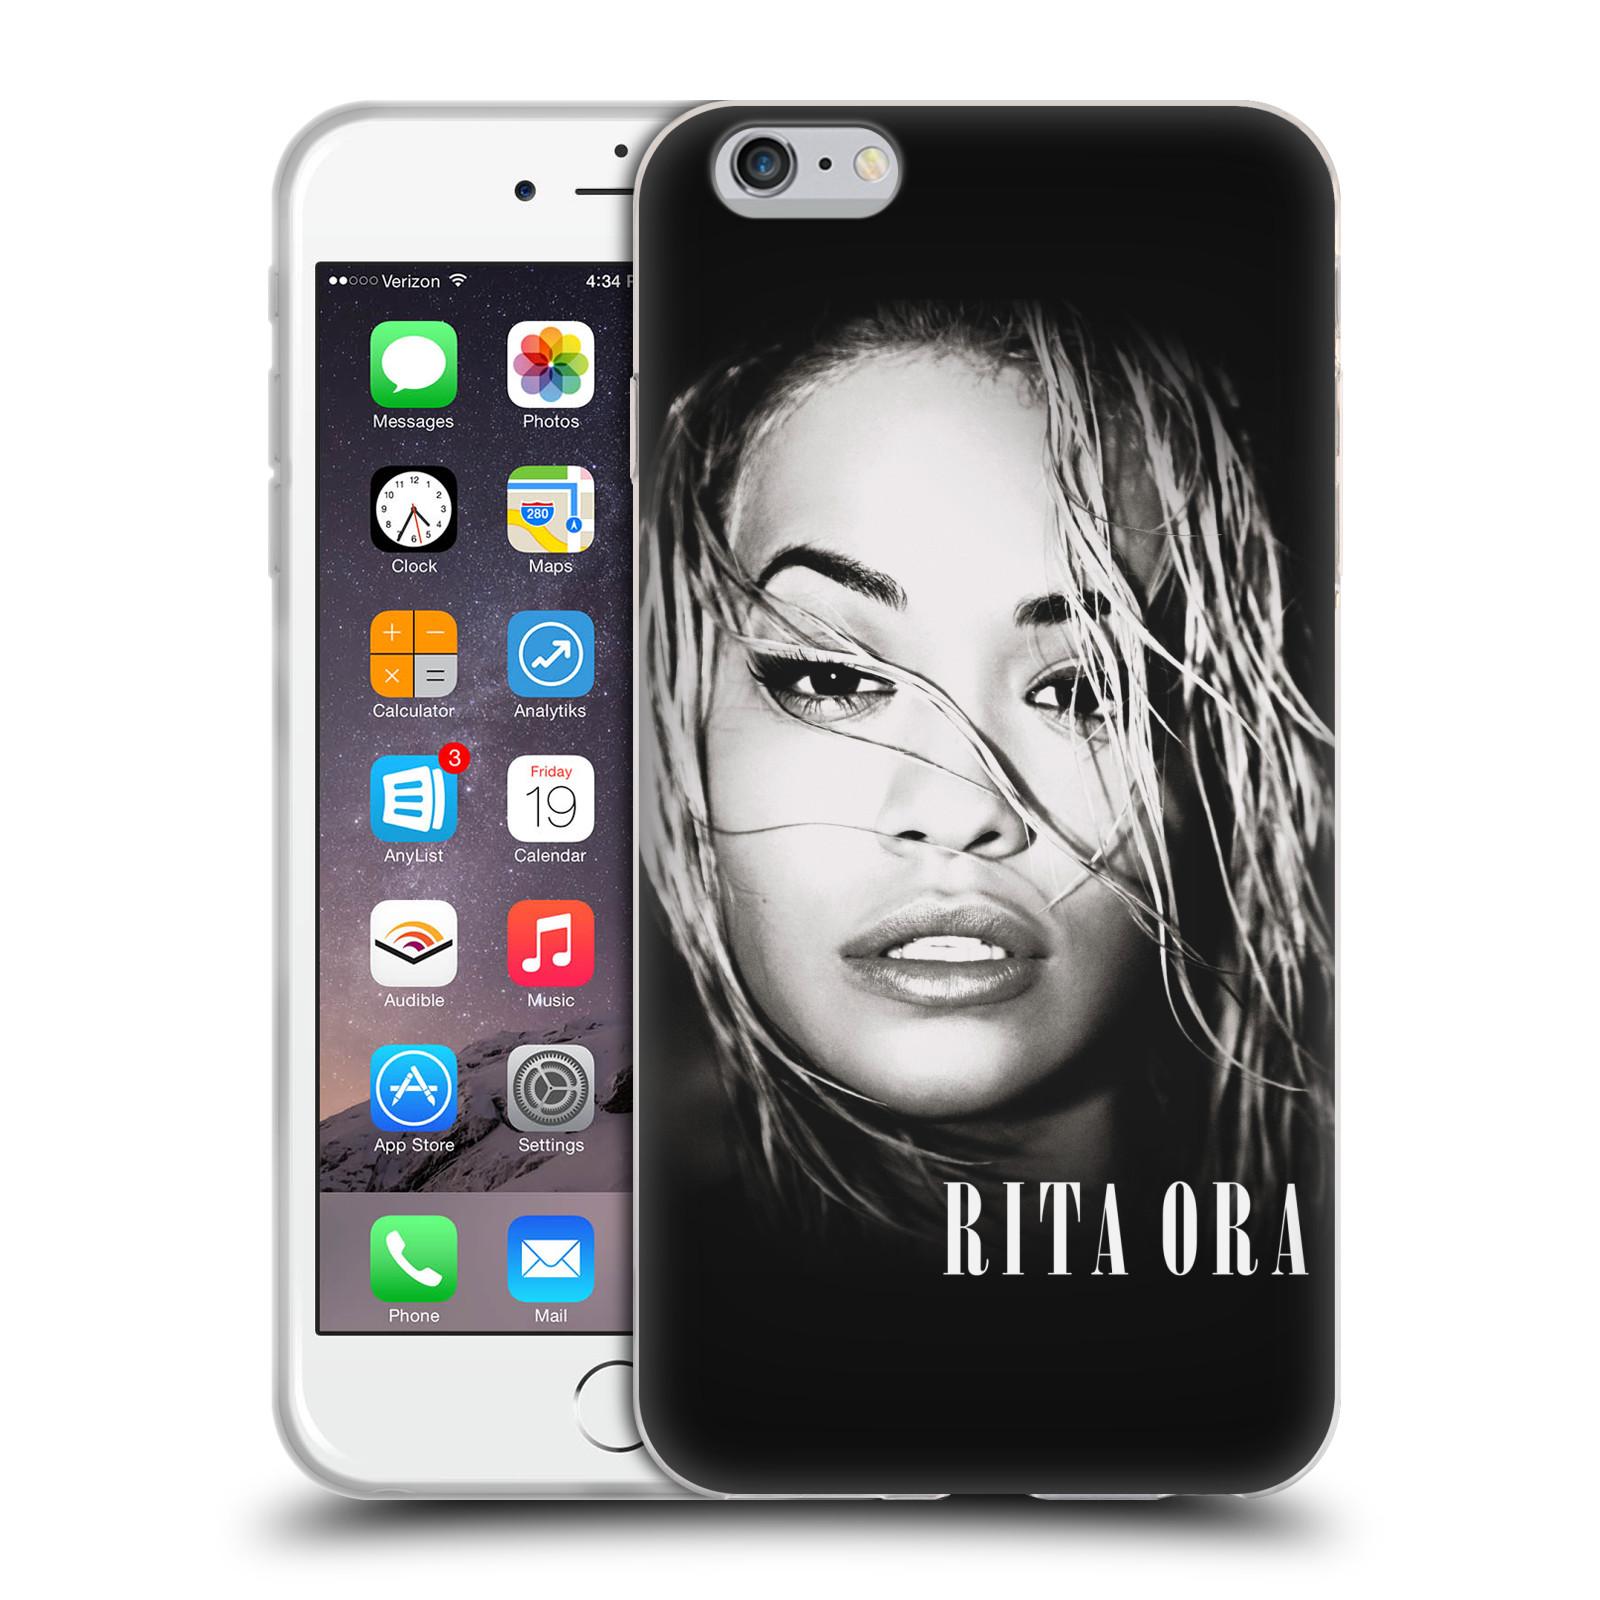 HEAD CASE silikonový obal na mobil Apple Iphone 6/6S PLUS zpěvačka Rita Ora foto tvář